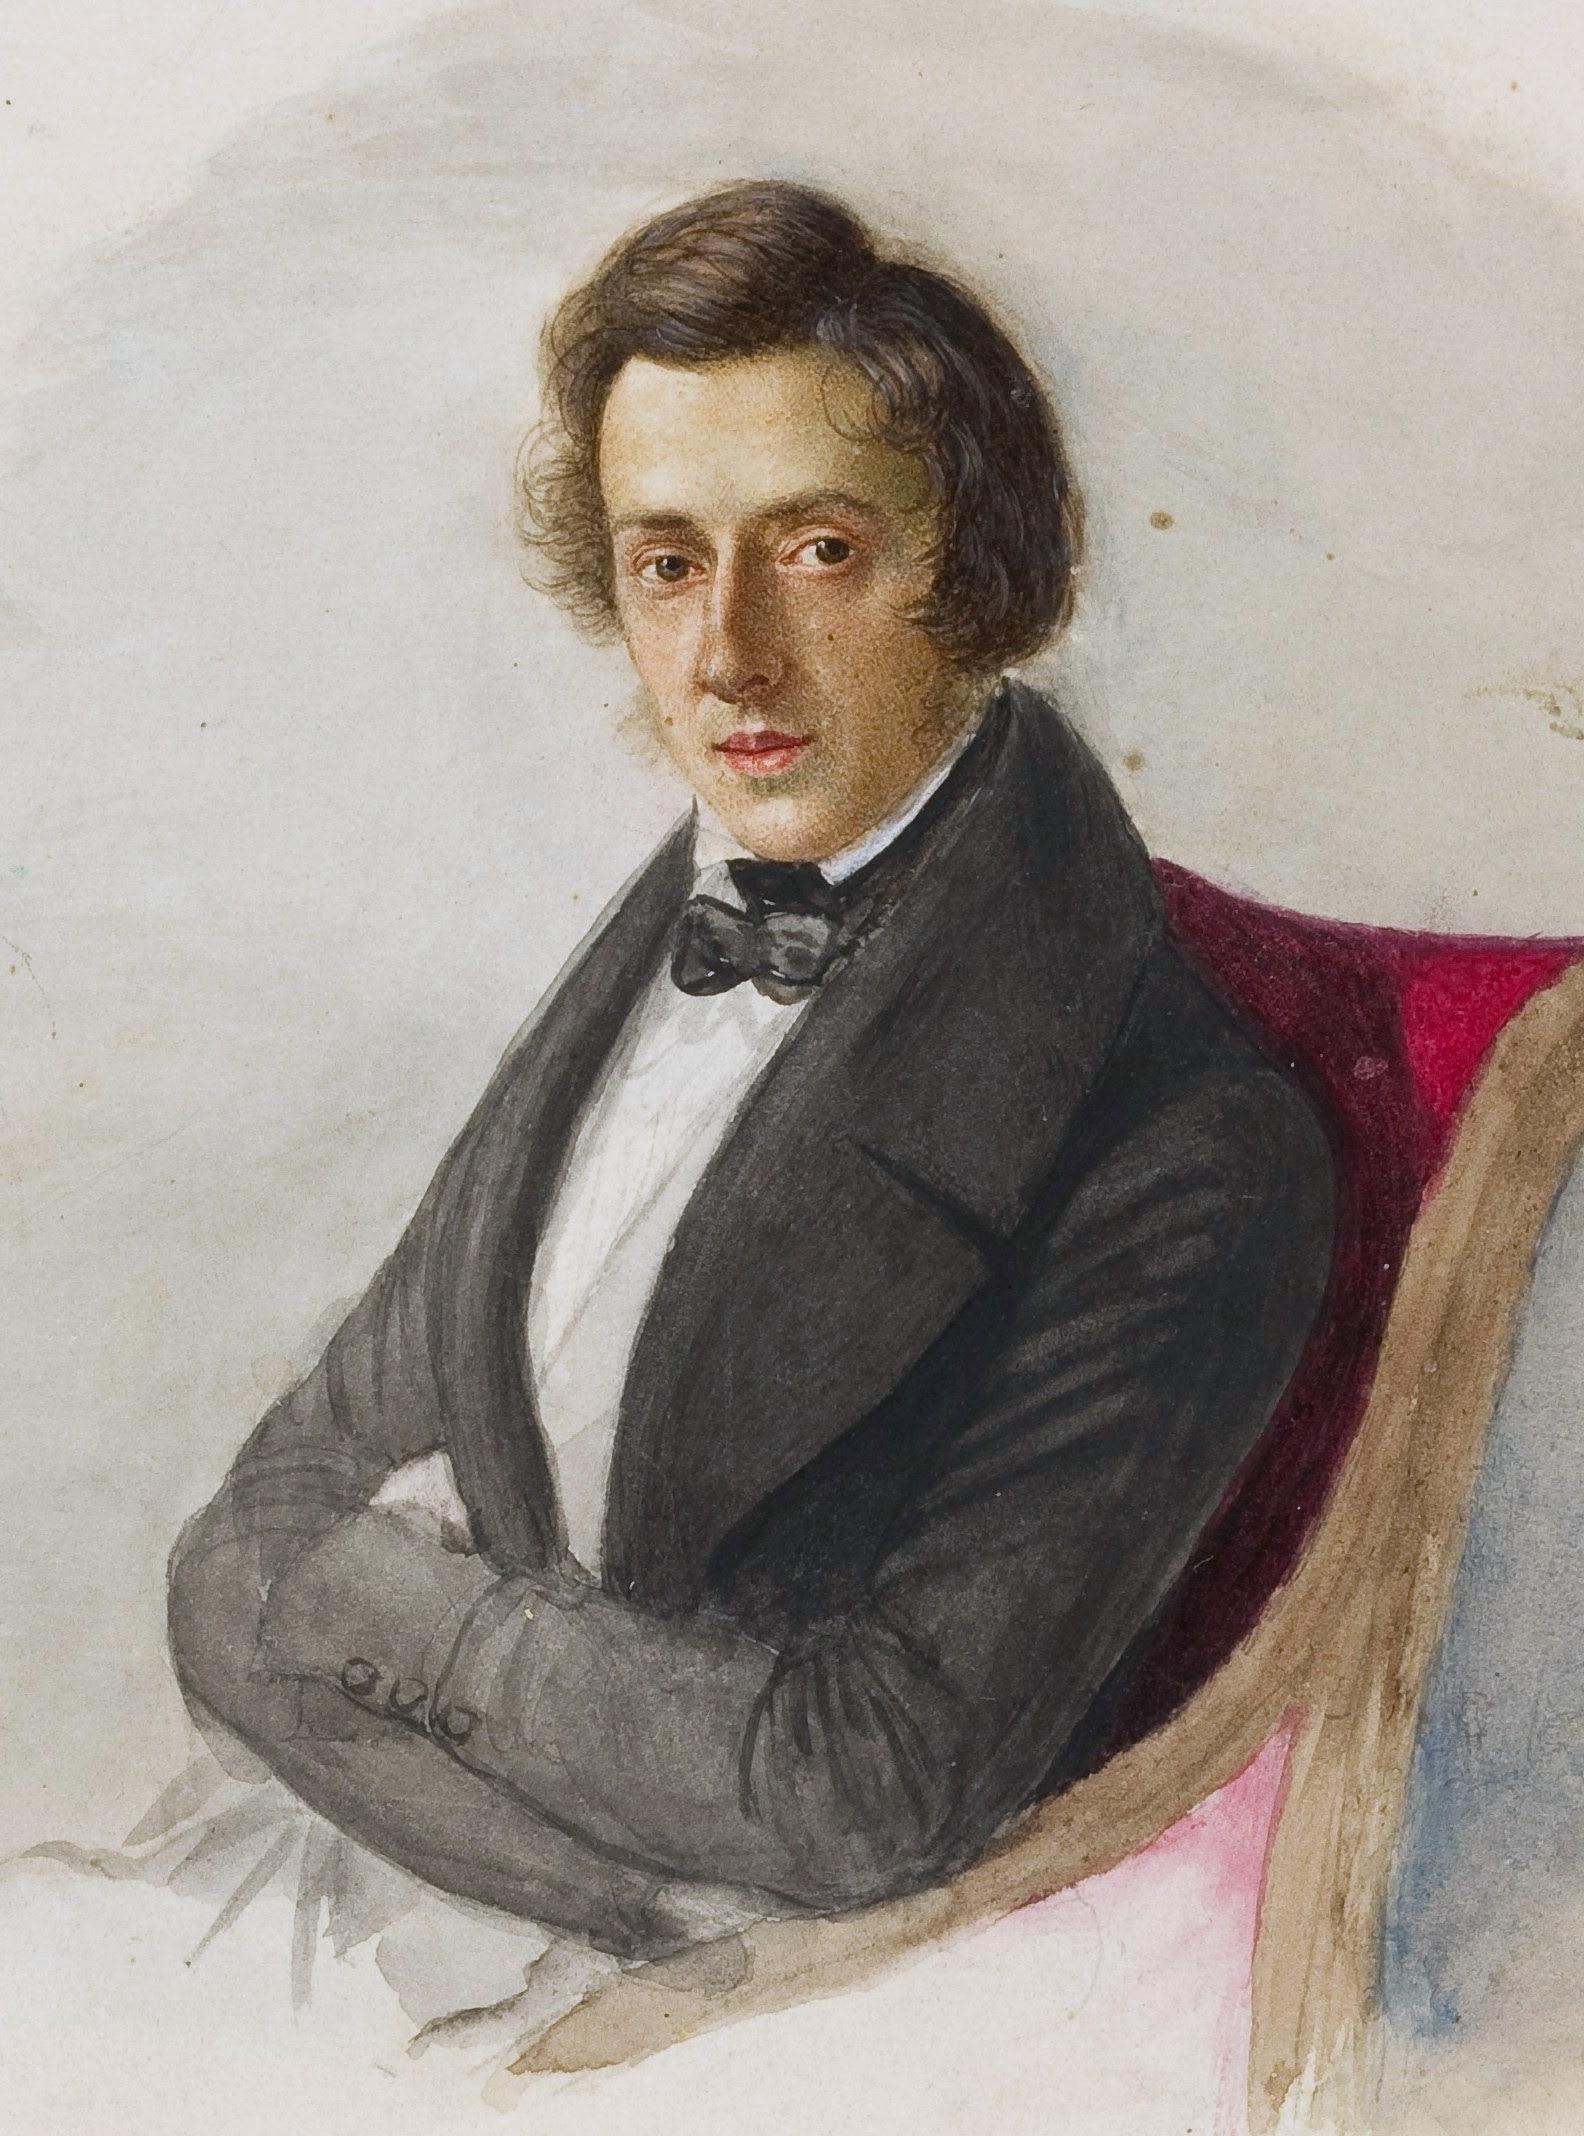 http://upload.wikimedia.org/wikipedia/commons/3/33/Chopin%2C_by_Wodzinska.JPG